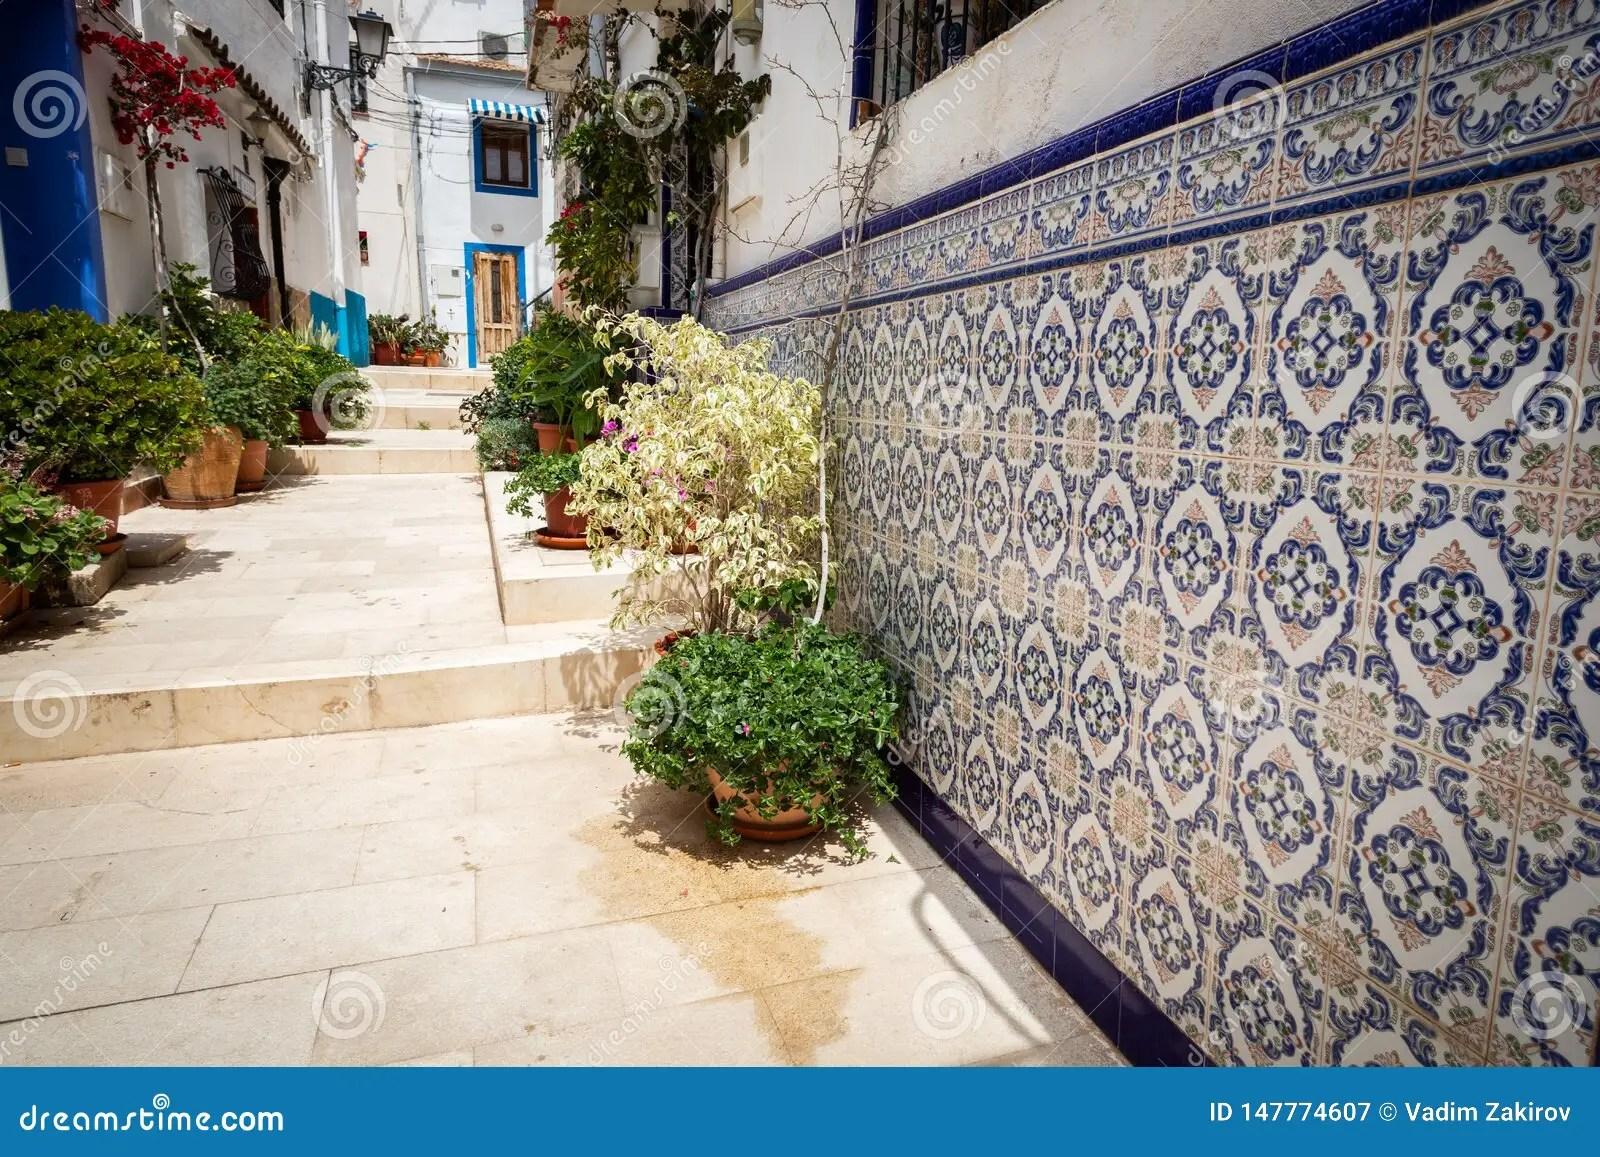 https www dreamstime com tipical spanish tile house street santa cruz disctrict alicante spain image147774607